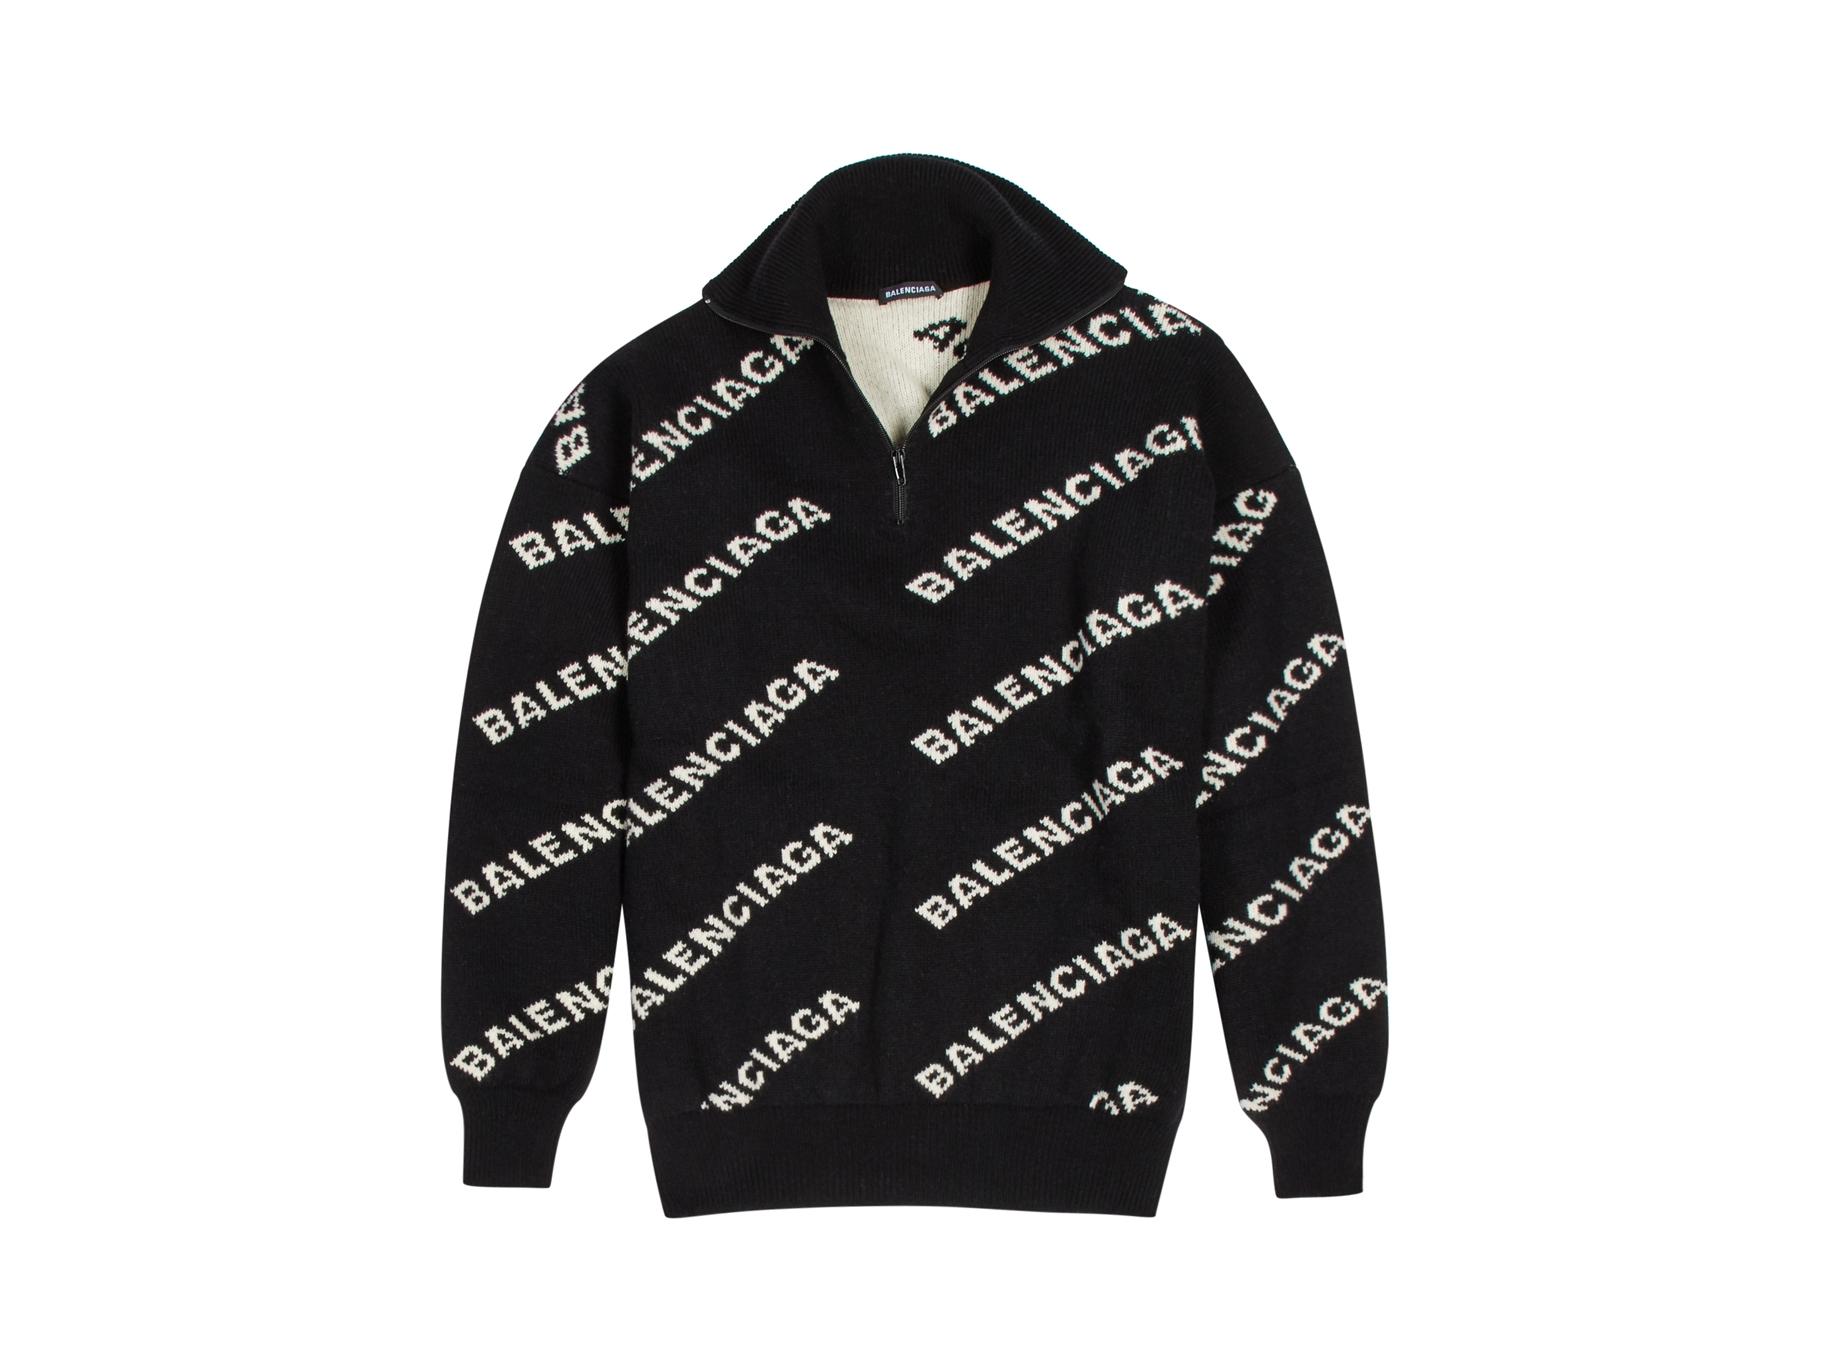 d5a044a5632ba Balenciaga Logo-intasia wool-blend jumper - Harvey Nichols